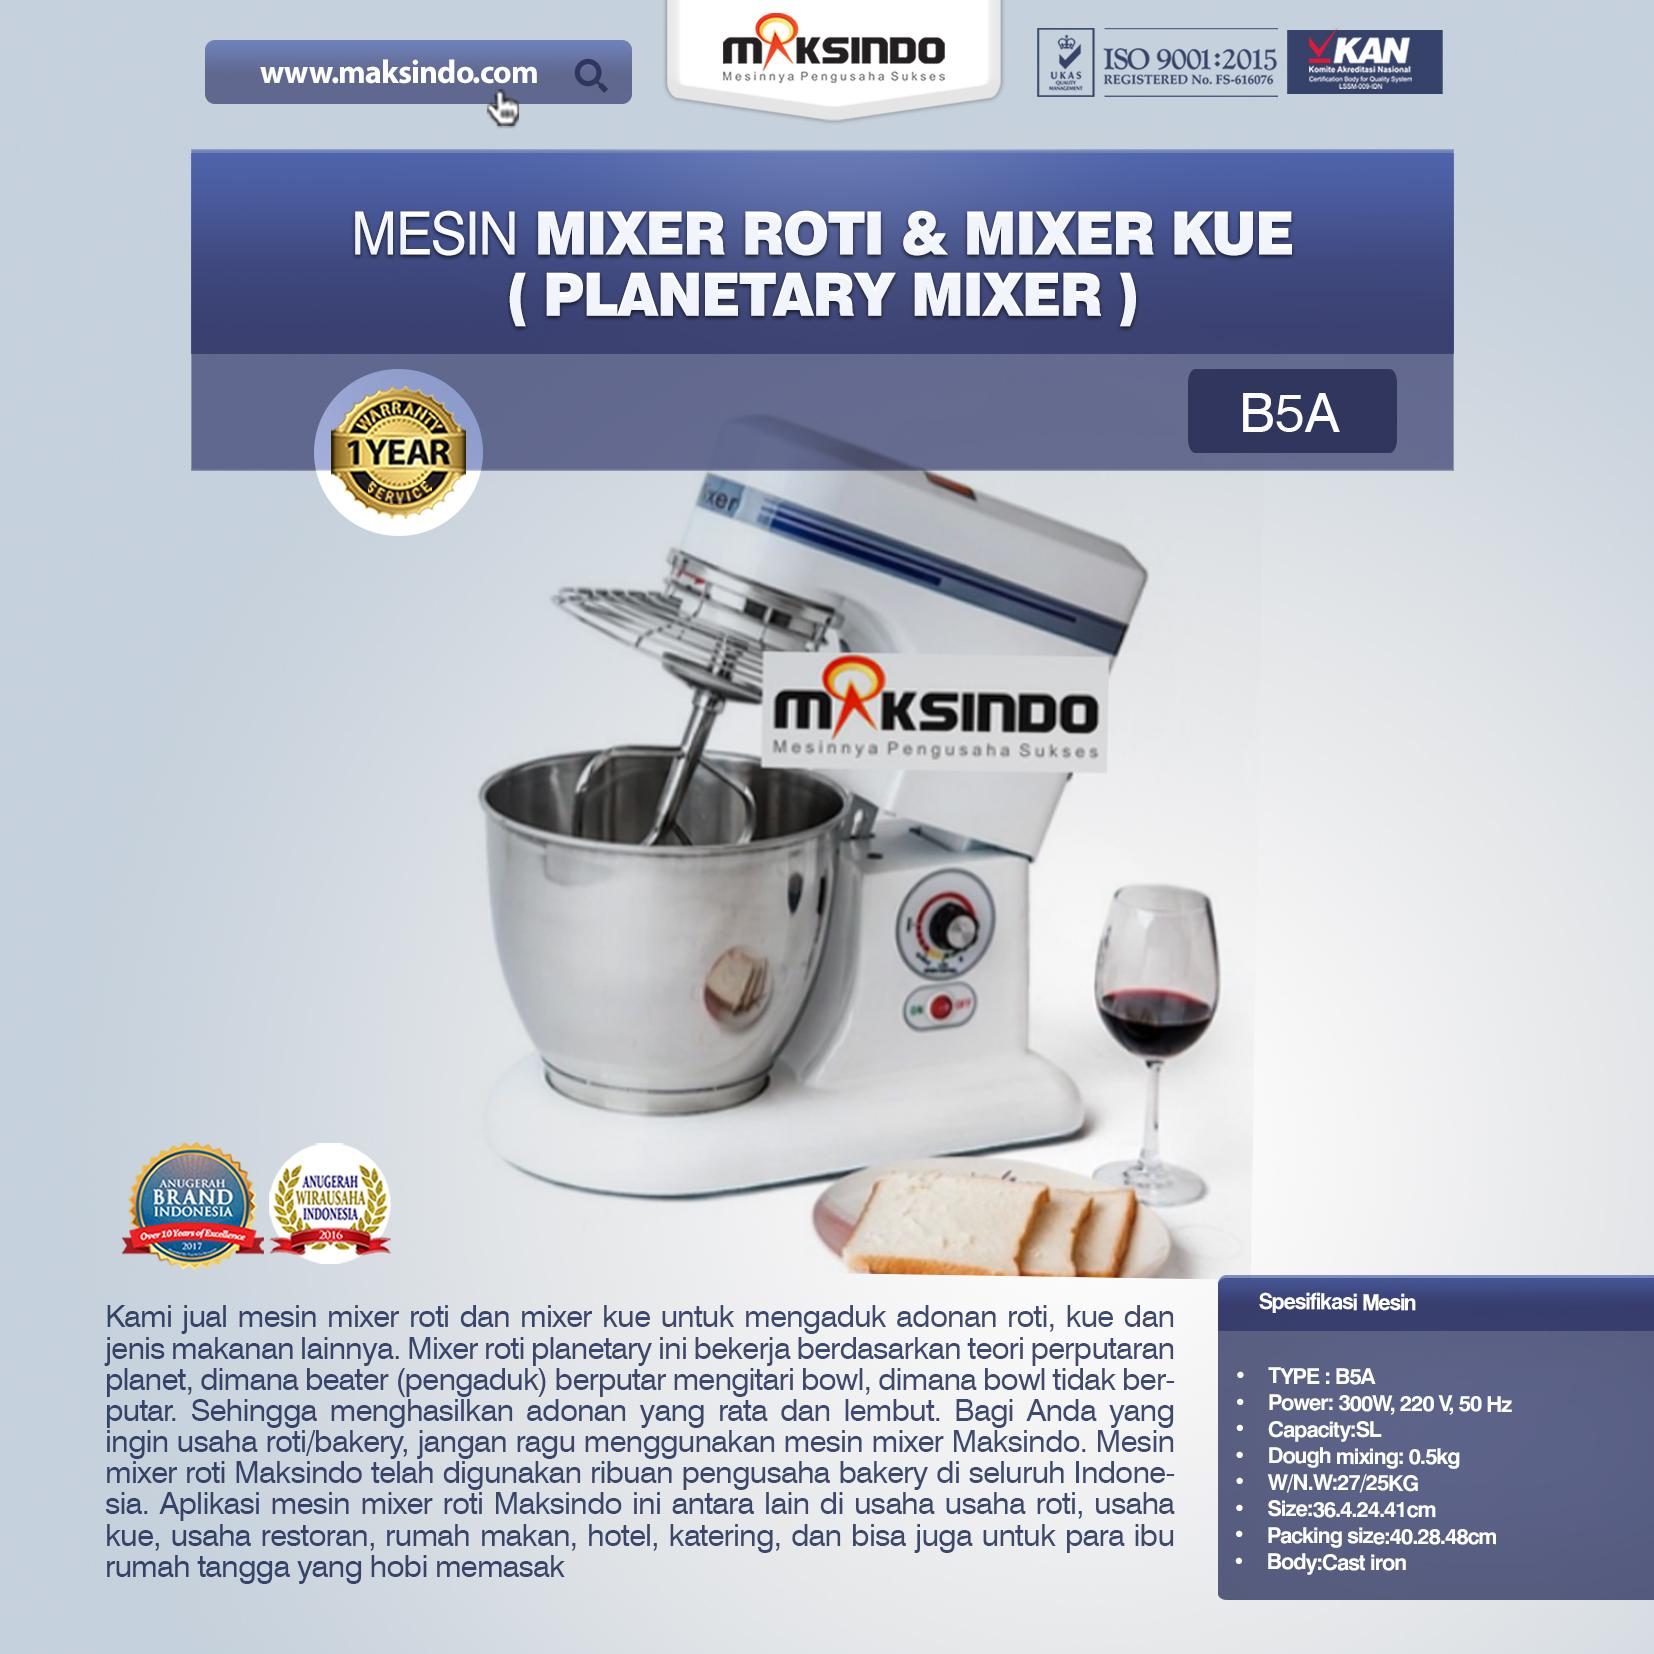 Jual Mesin Mixer Roti Planetary di Denpasar, Bali